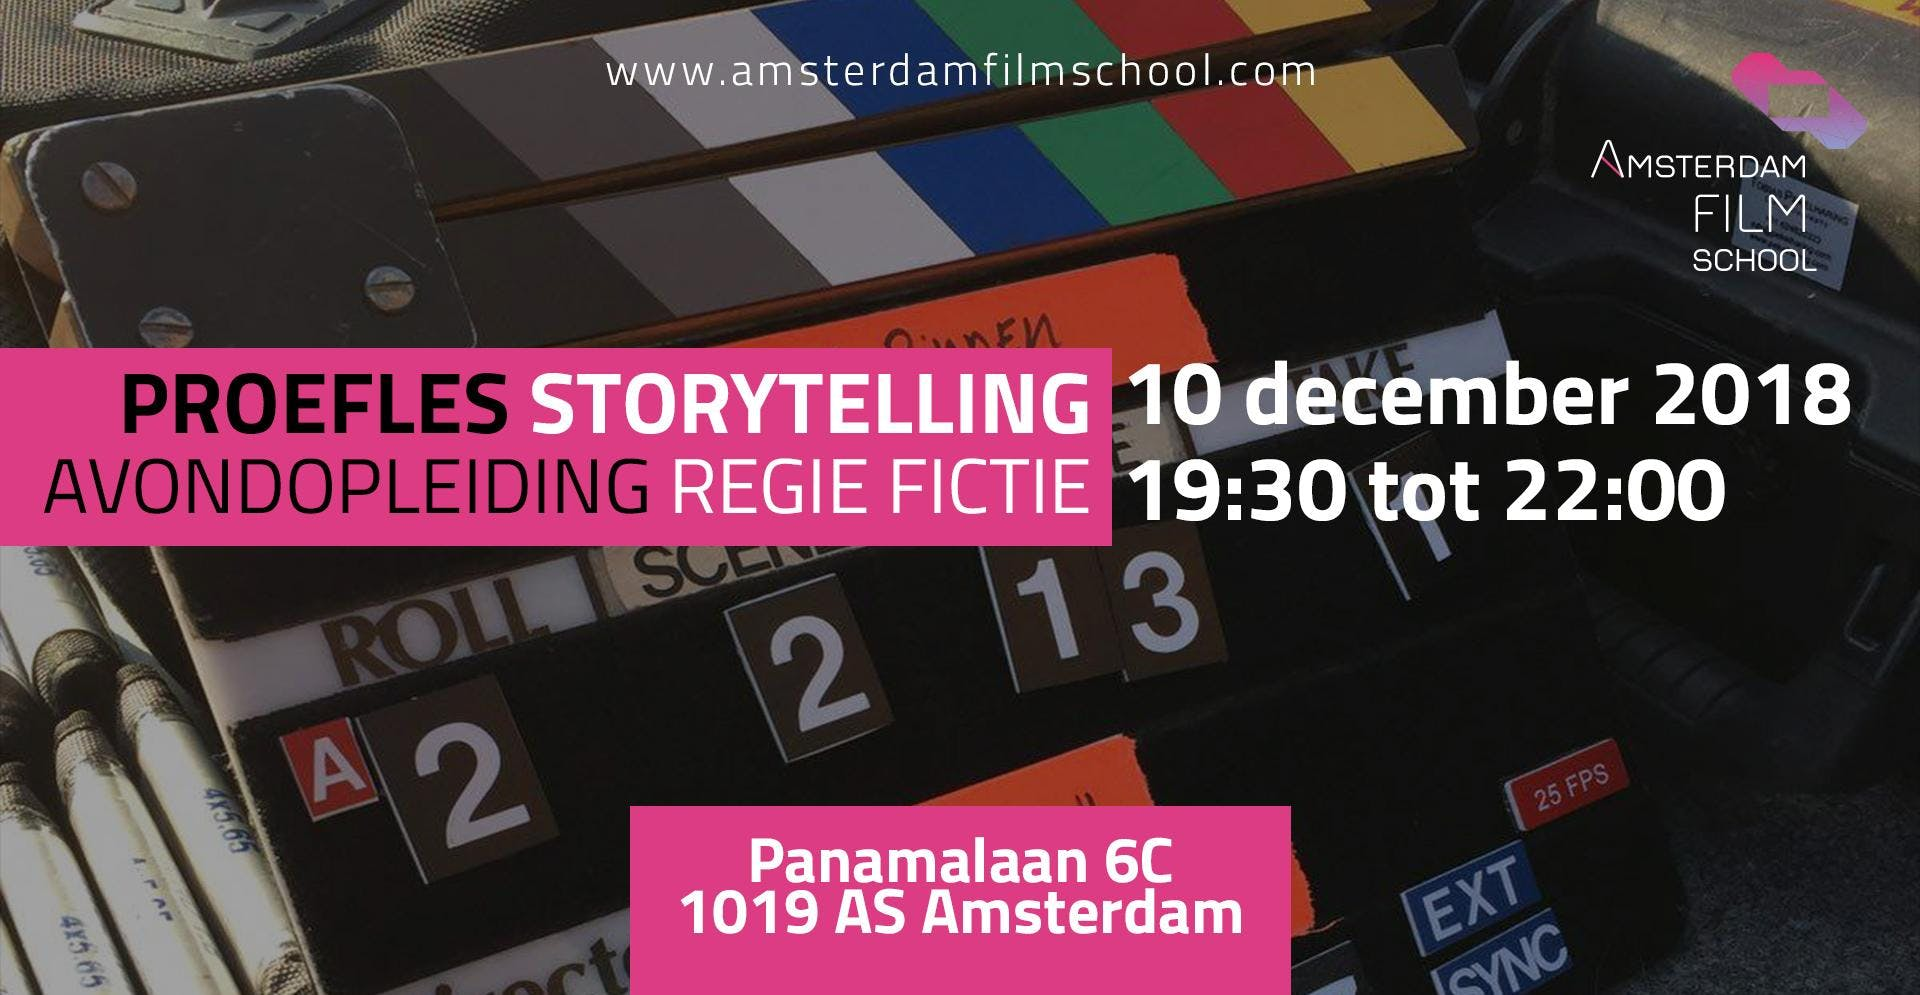 Proefles Storytelling - Avondopleiding Regie